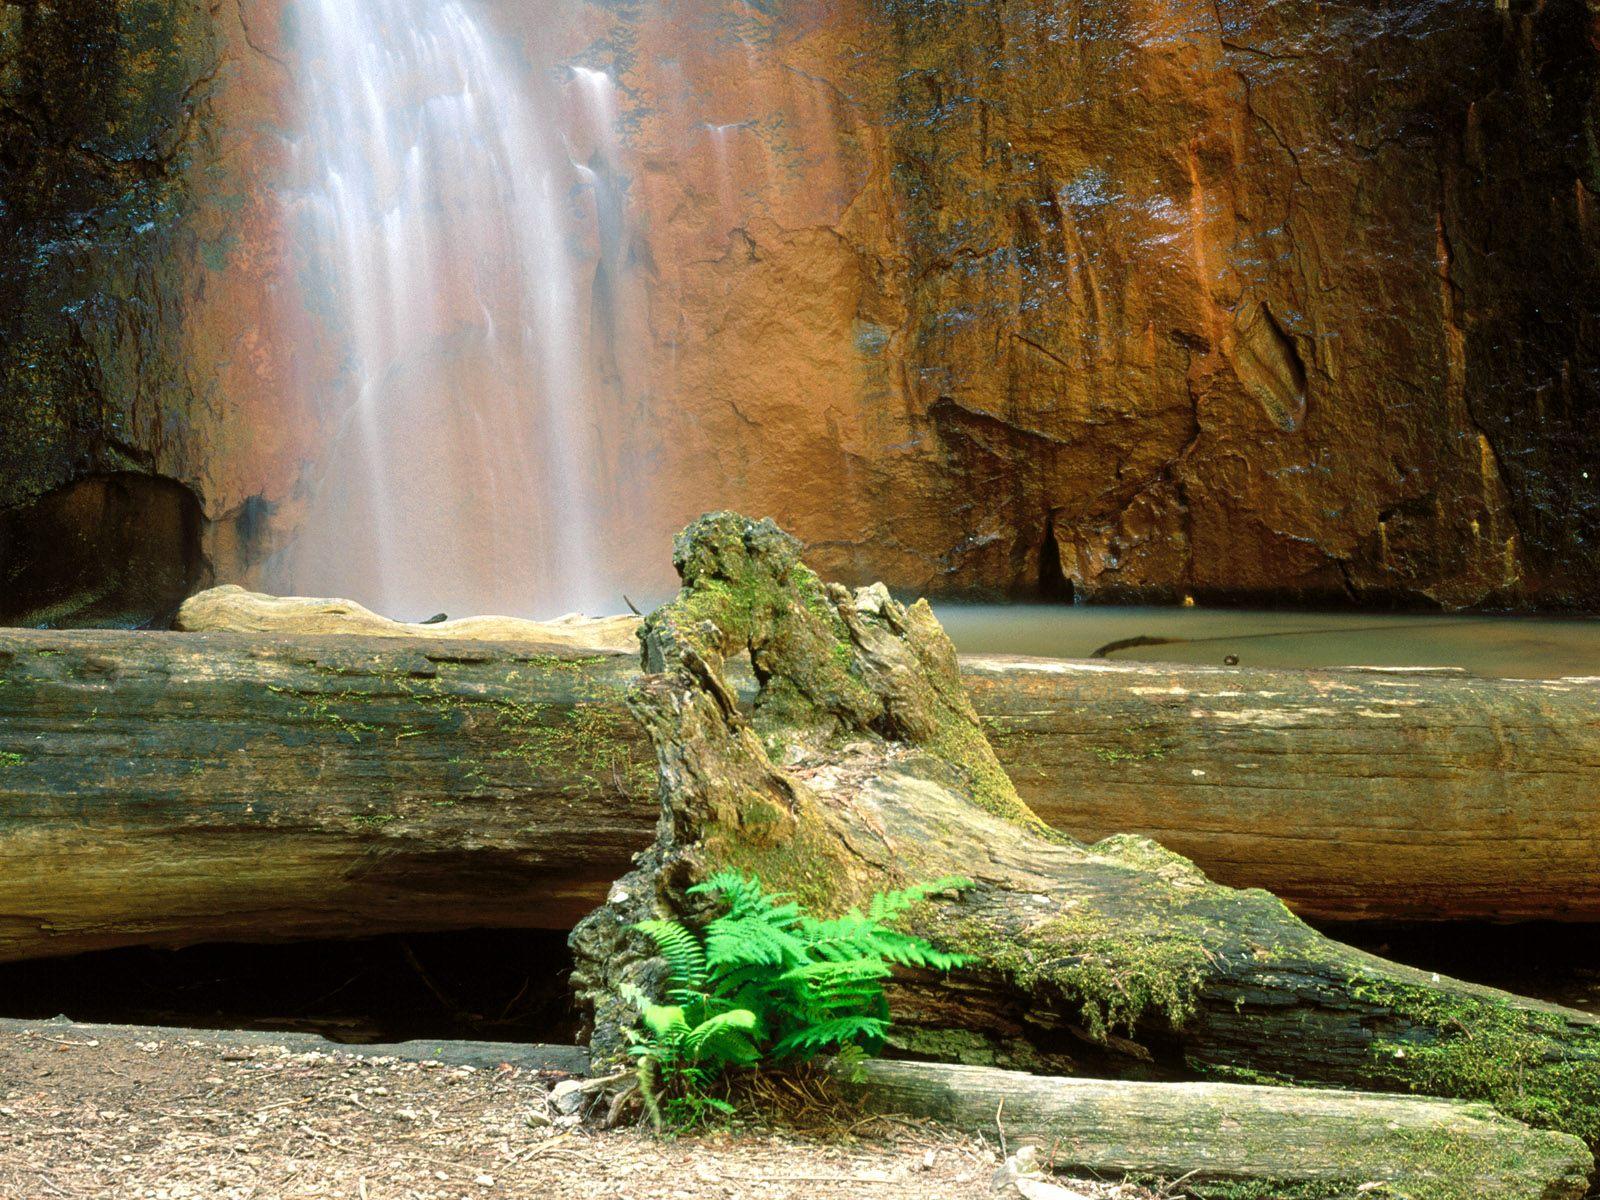 http://1.bp.blogspot.com/-jHEZiVIKAoQ/UD_YgOEqVhI/AAAAAAAAAFo/YLFI2RaaWBE/s1600/Nature+Landscapes+HD+Wallpapers+(5).jpg